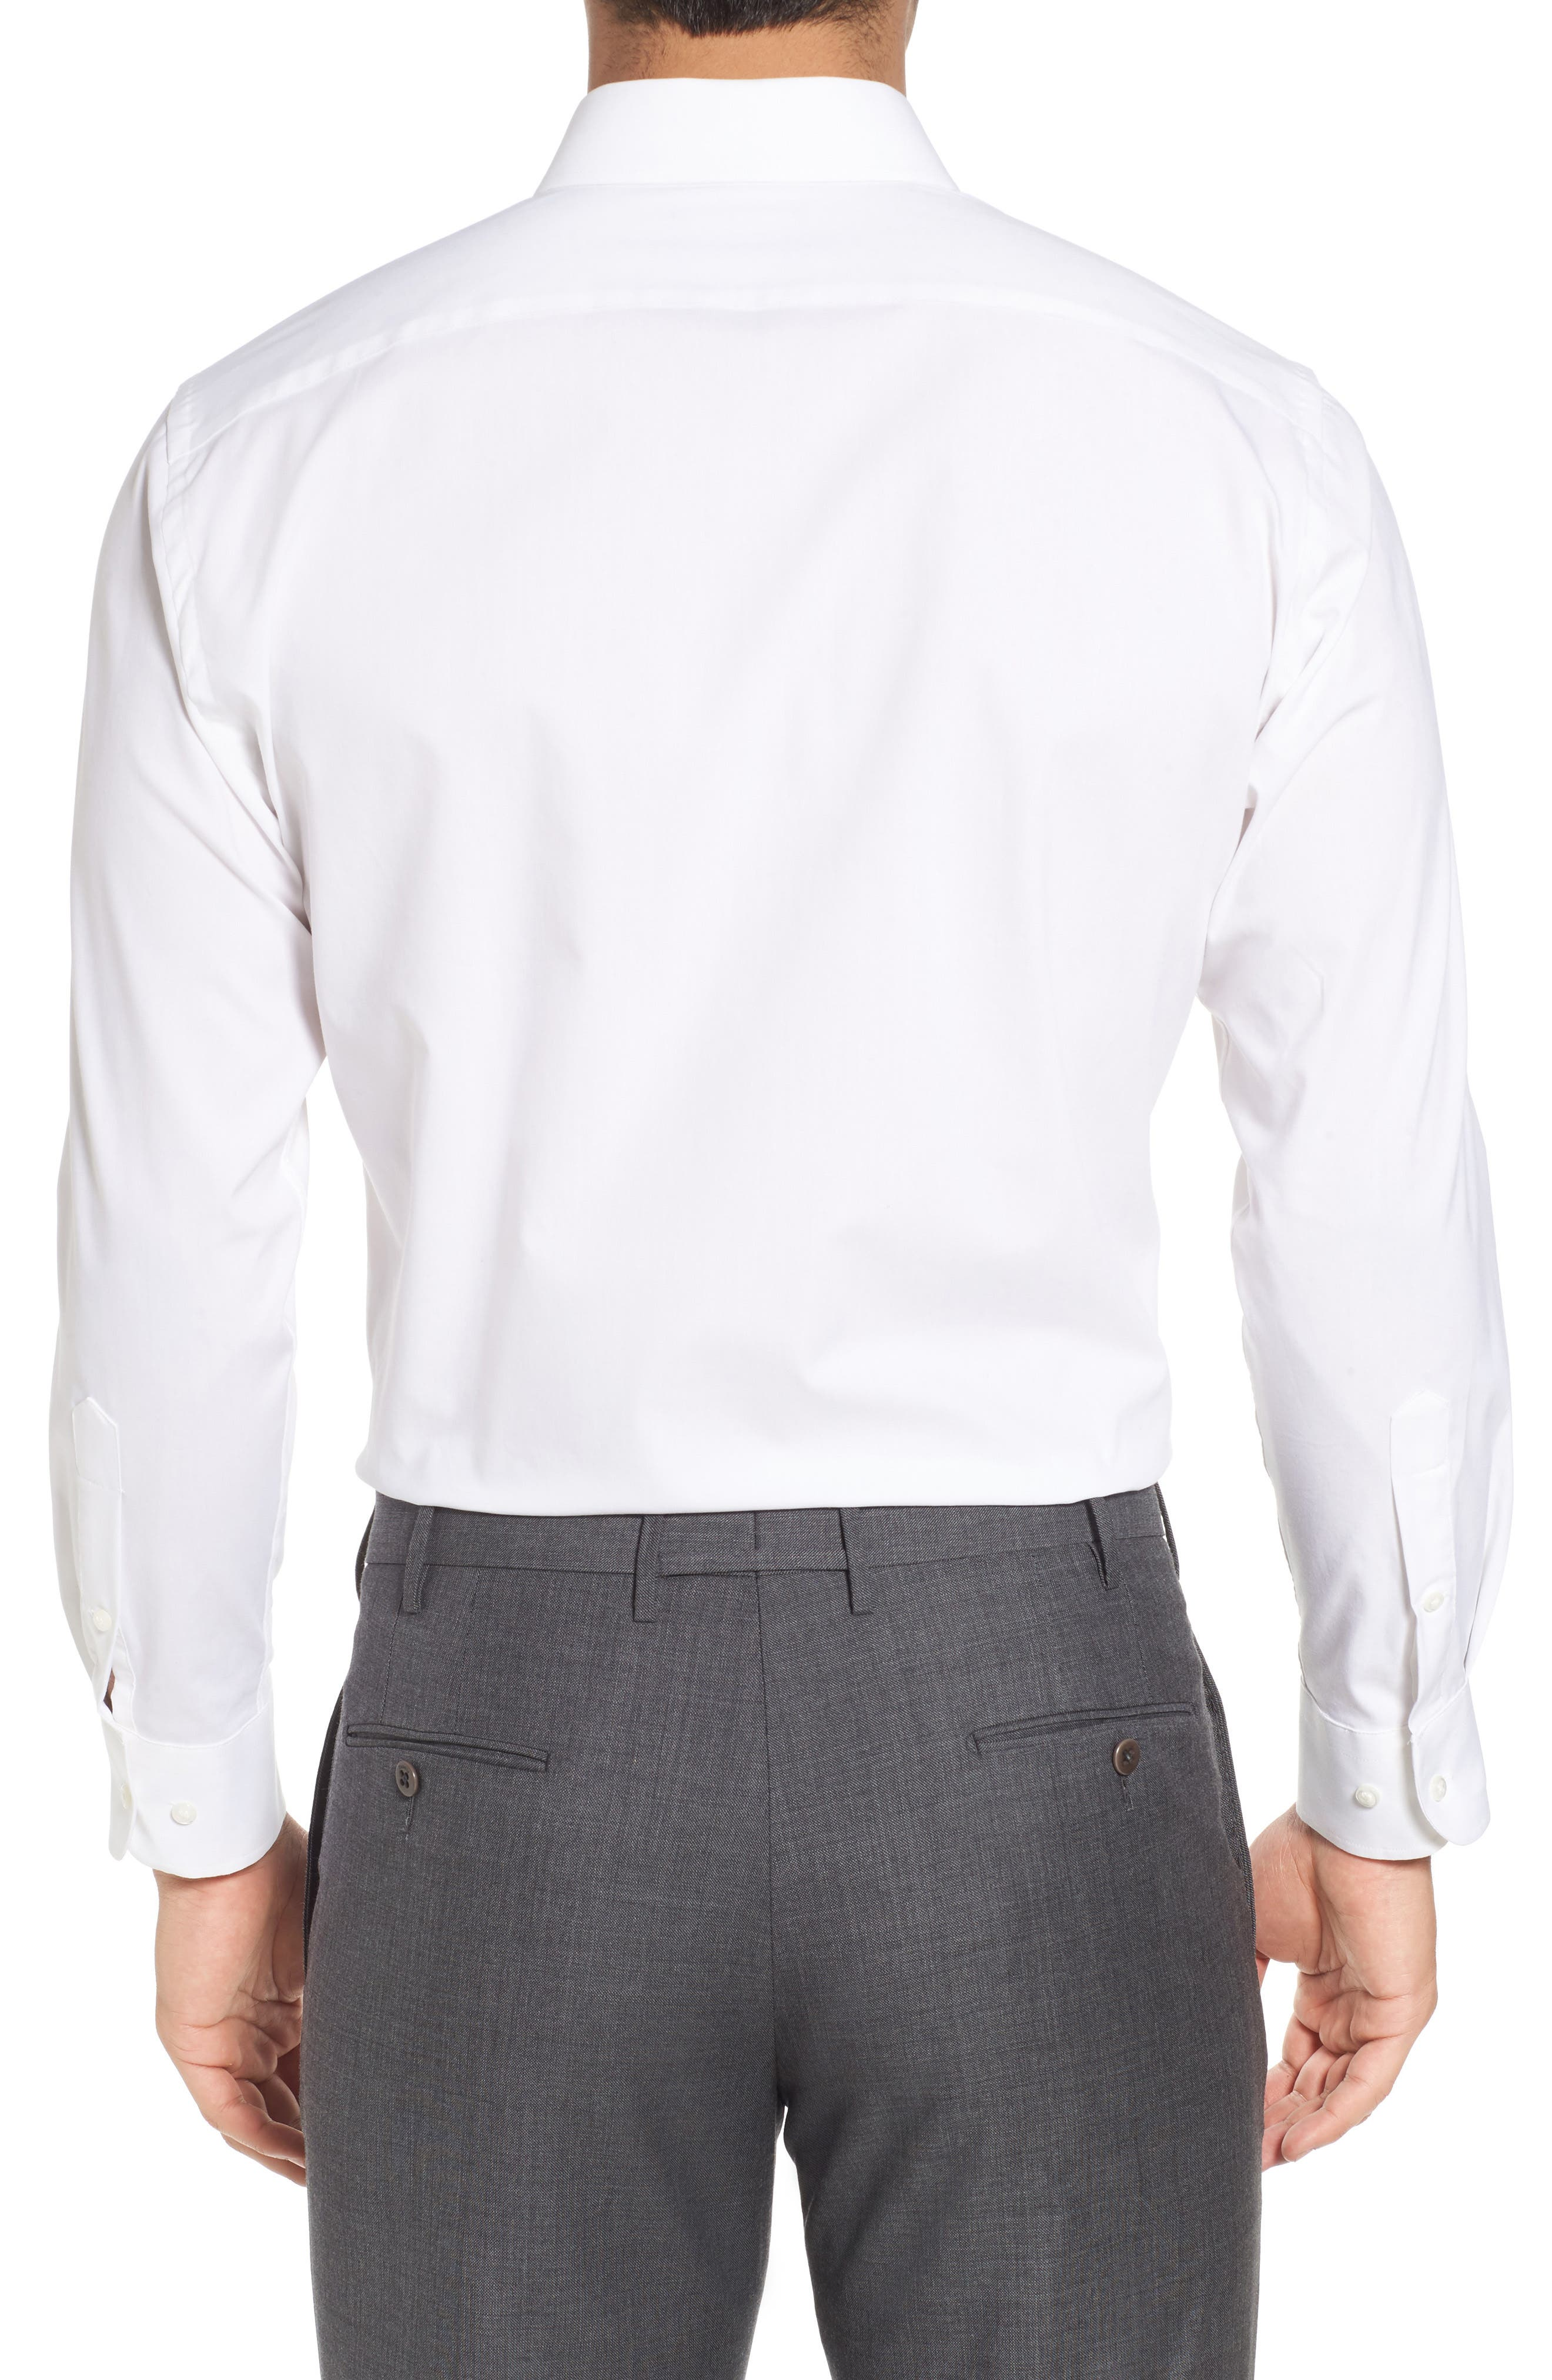 Tech-Smart Trim Fit Stretch Solid Dress Shirt,                             Alternate thumbnail 2, color,                             White